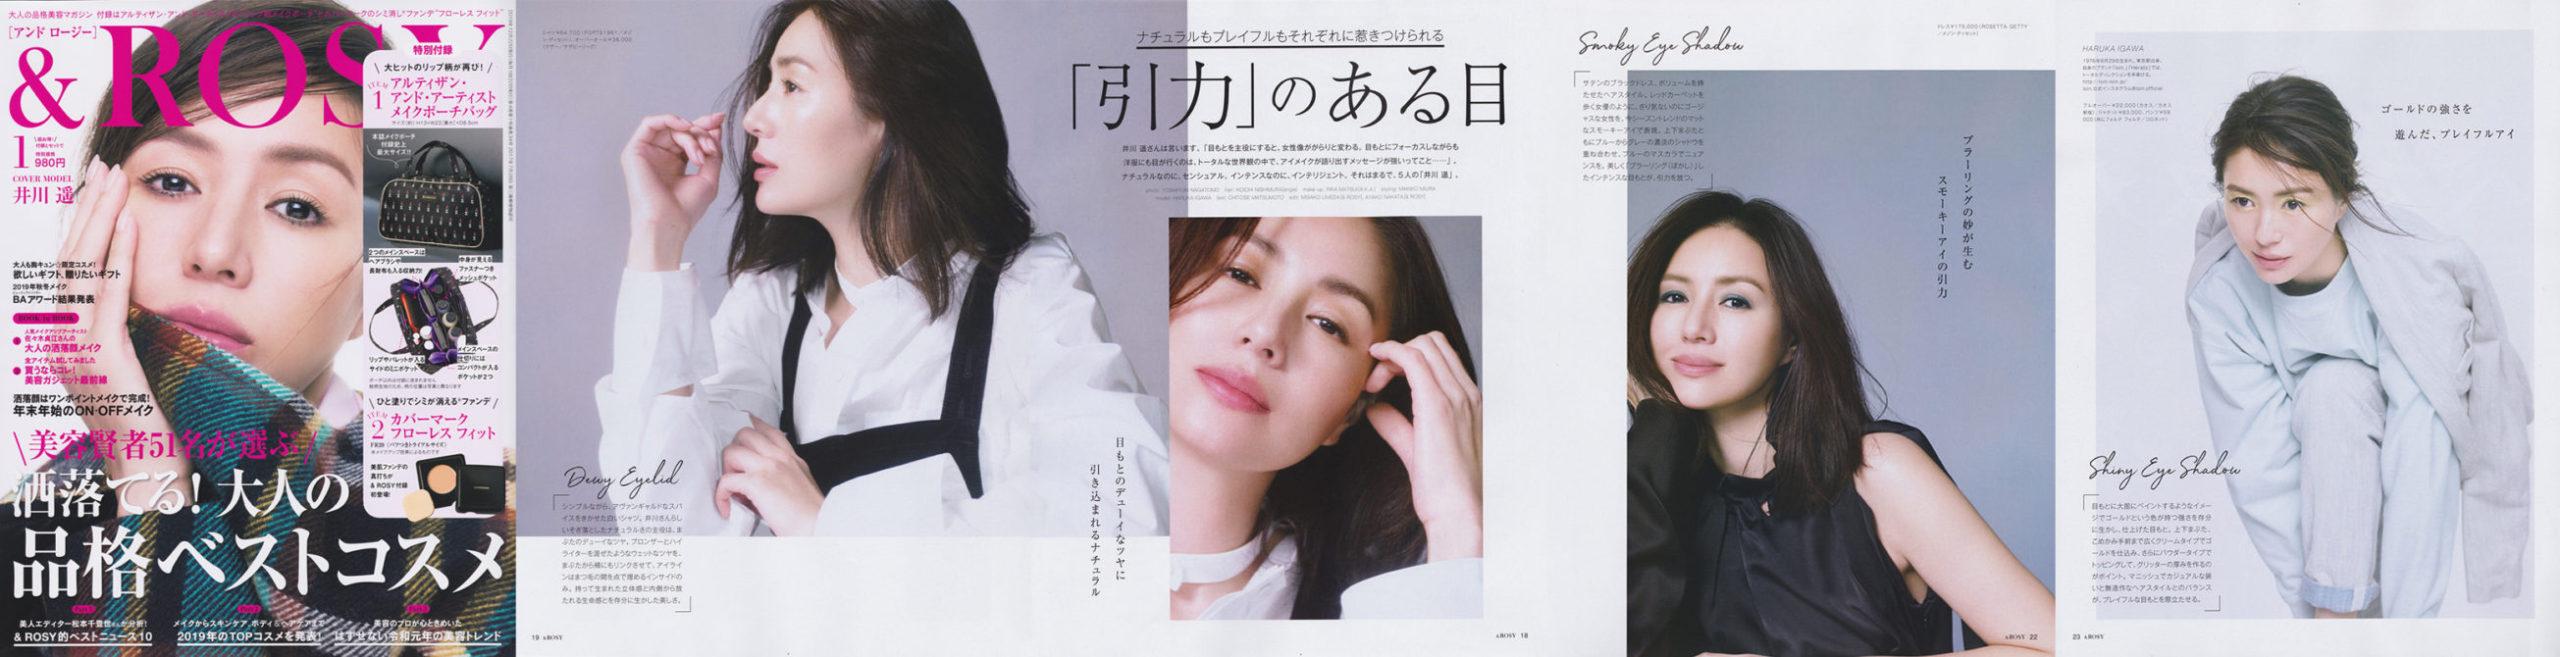 &ROSY  2020 1月号 Cover